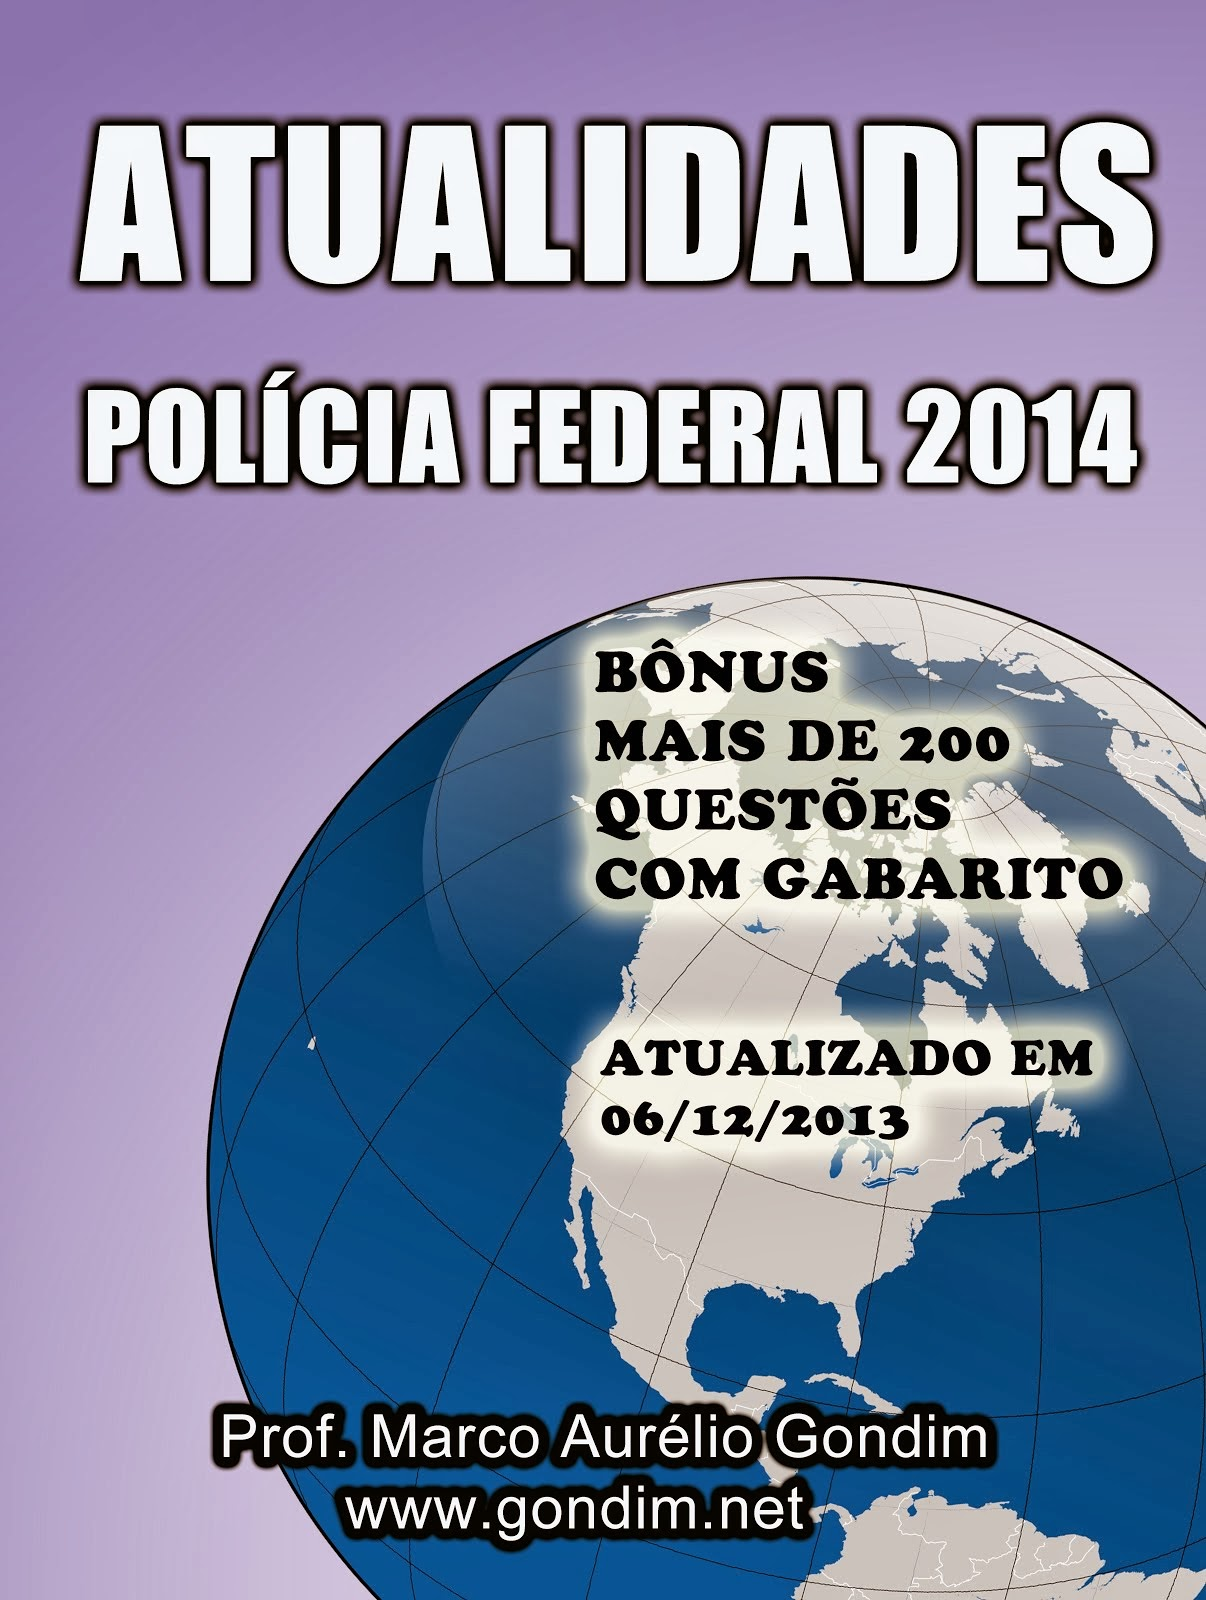 Atualidades - Concurso PF